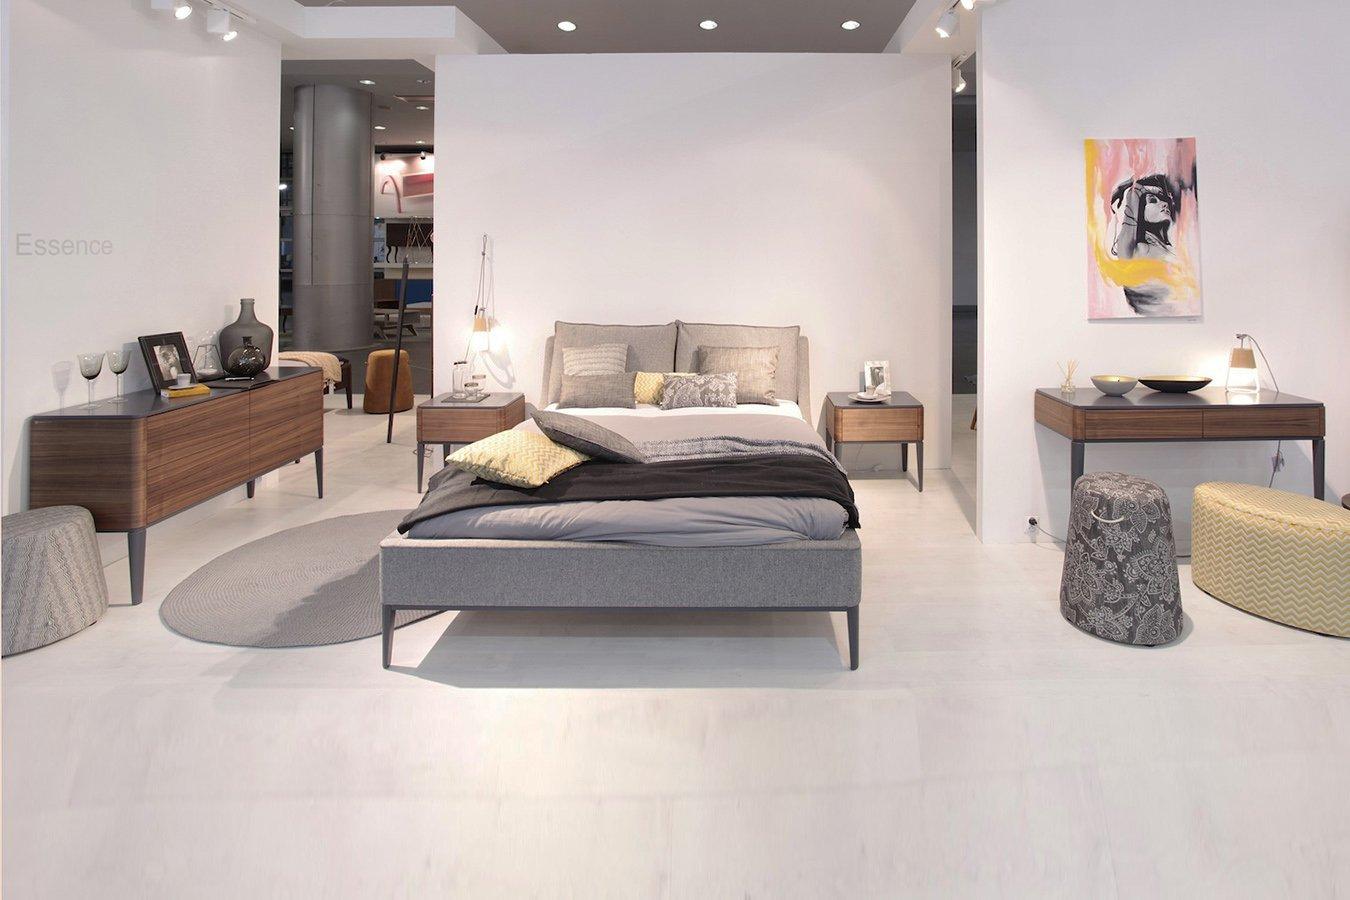 test1 Мебель для спальни Essence (Swarzedz Home, Польша)